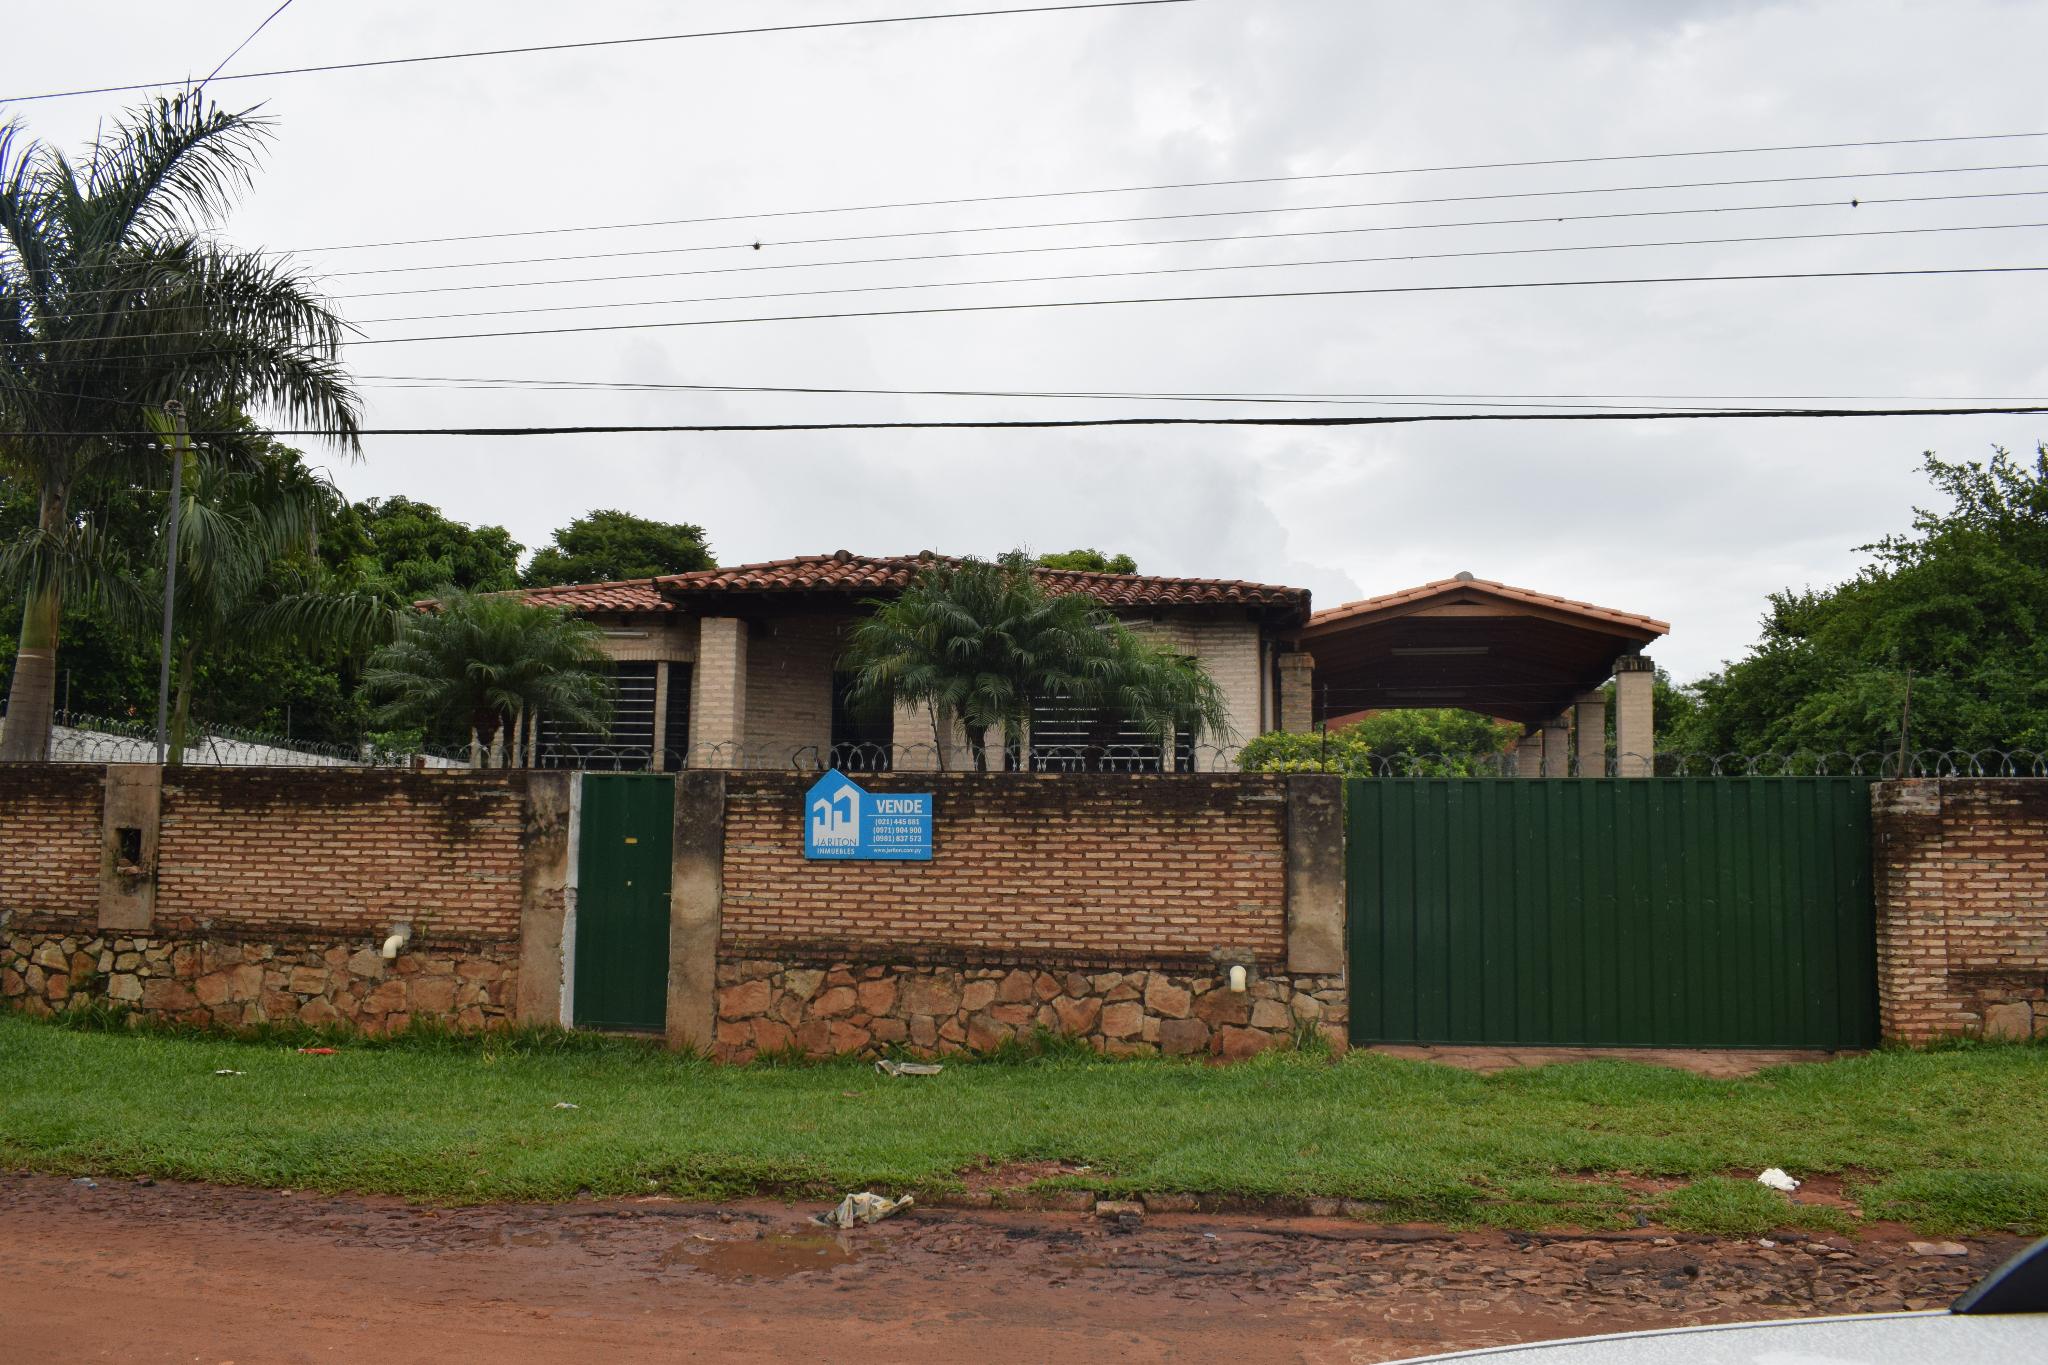 Vendo Dos Terrenos Con Casa En Villa Elisa Zona Tres Bocas